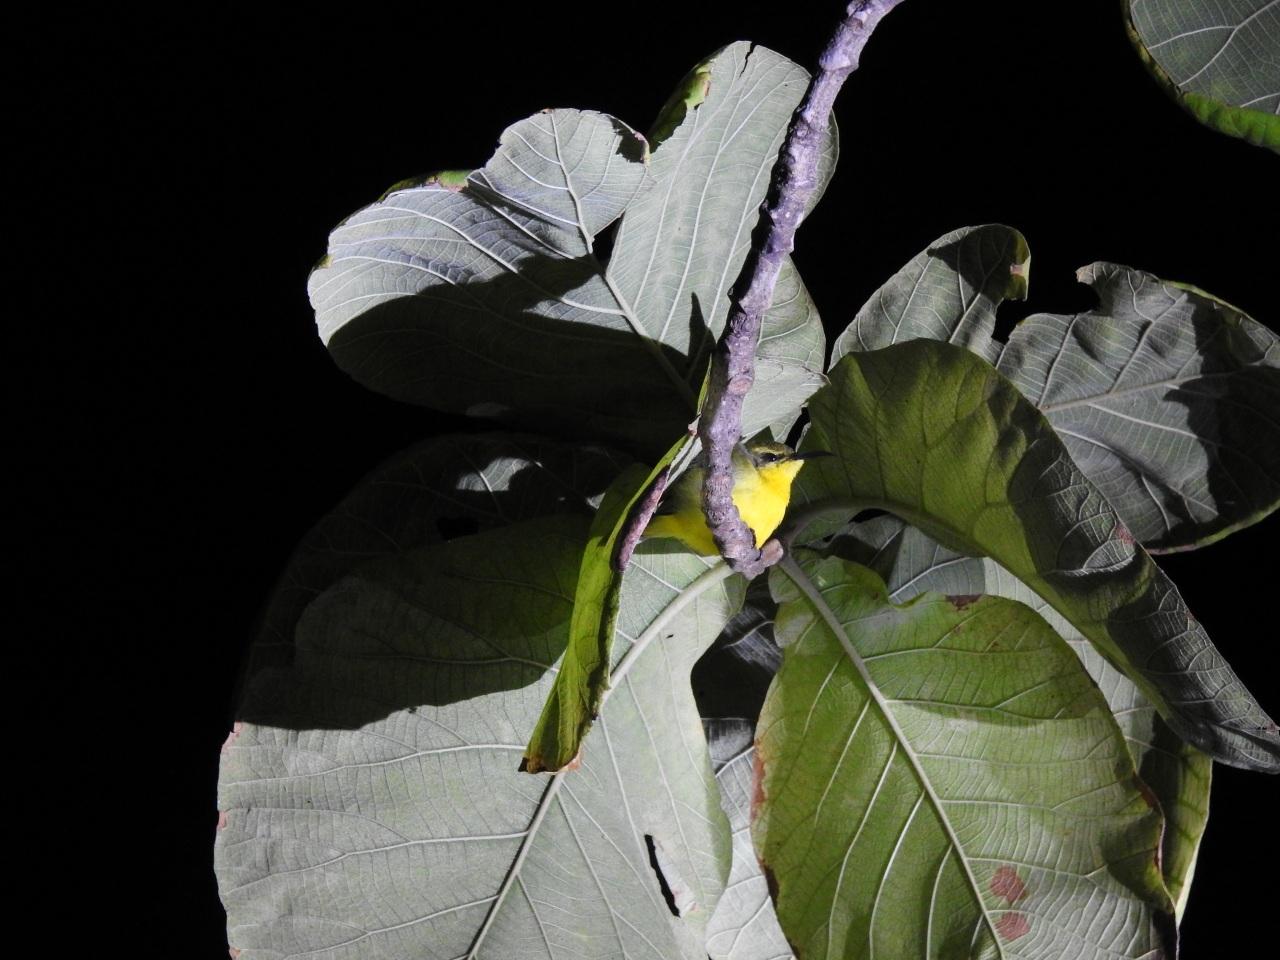 olivebacksunbirdnight